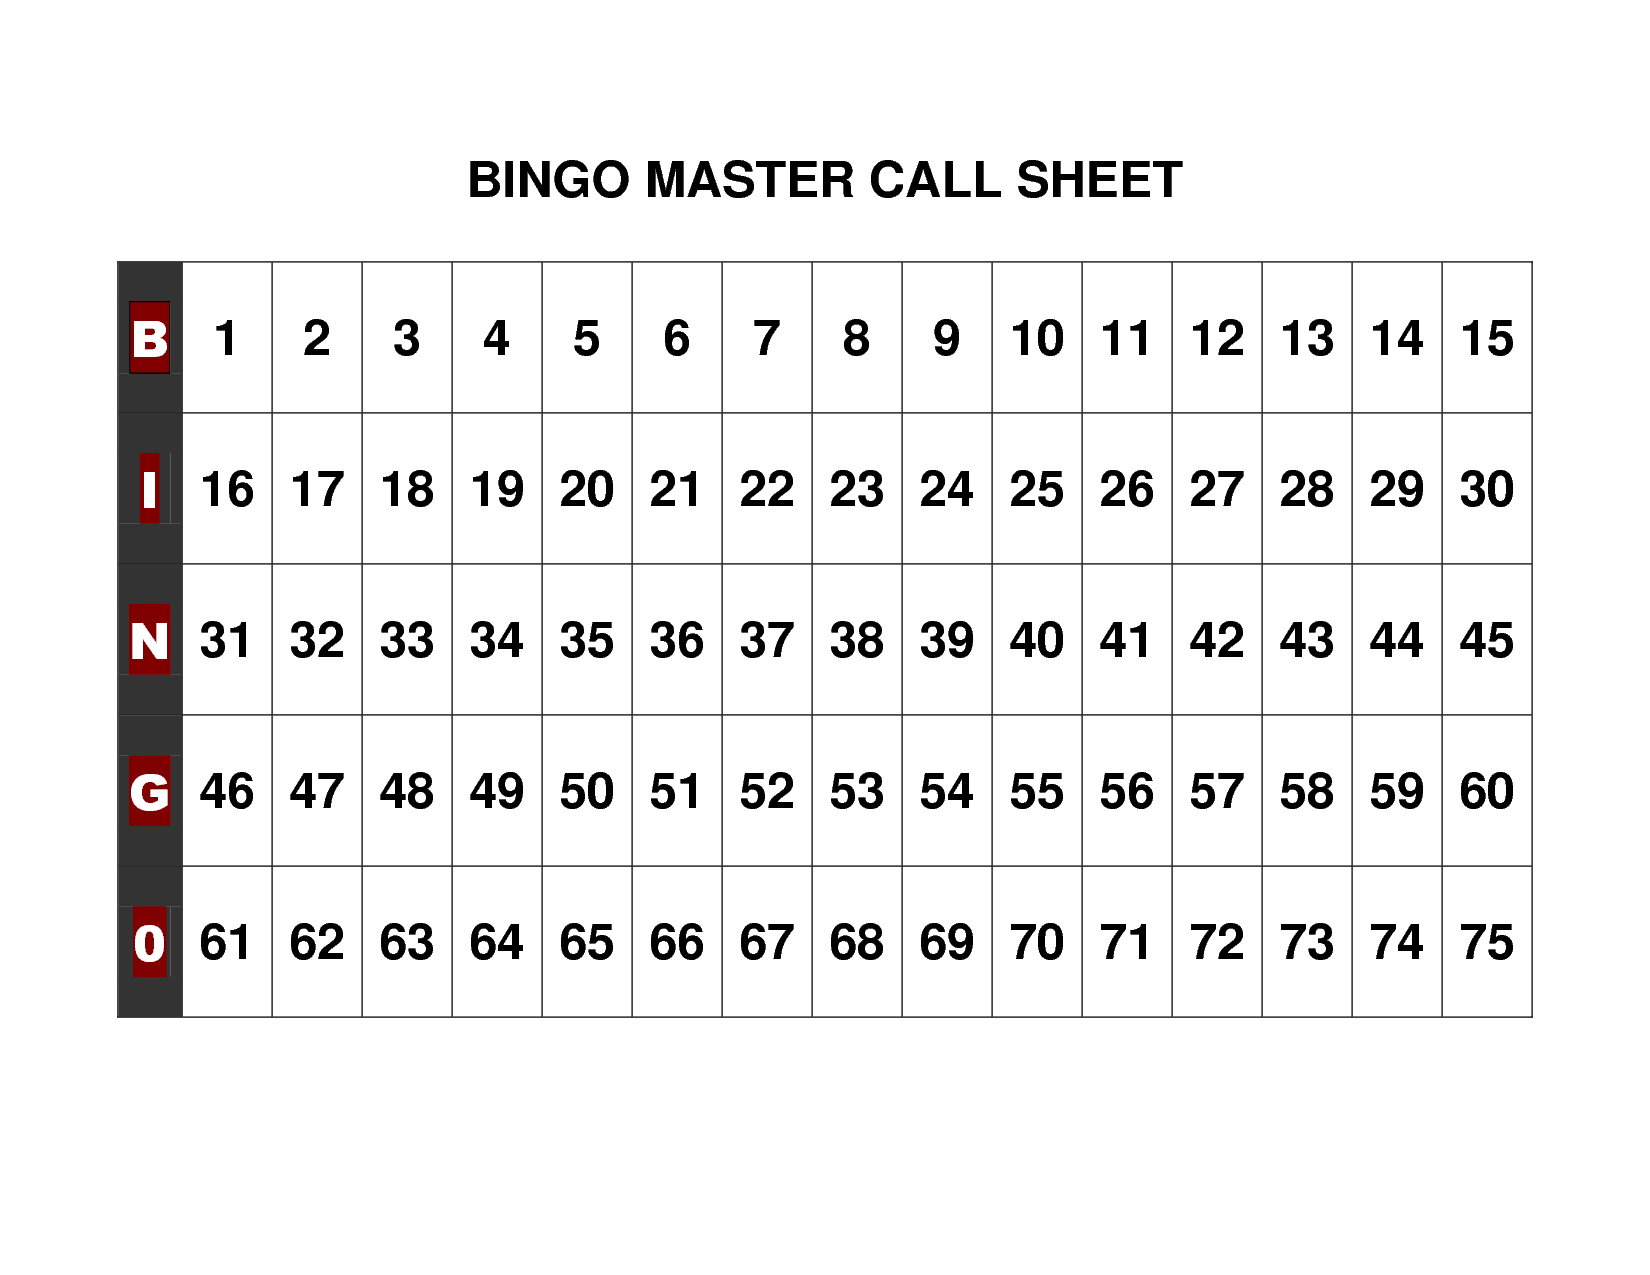 Free+Printable+Bingo+Call+Sheet | Bingo | Pinterest | Bingo, Bingo - Free Printable Bingo Cards 1 75